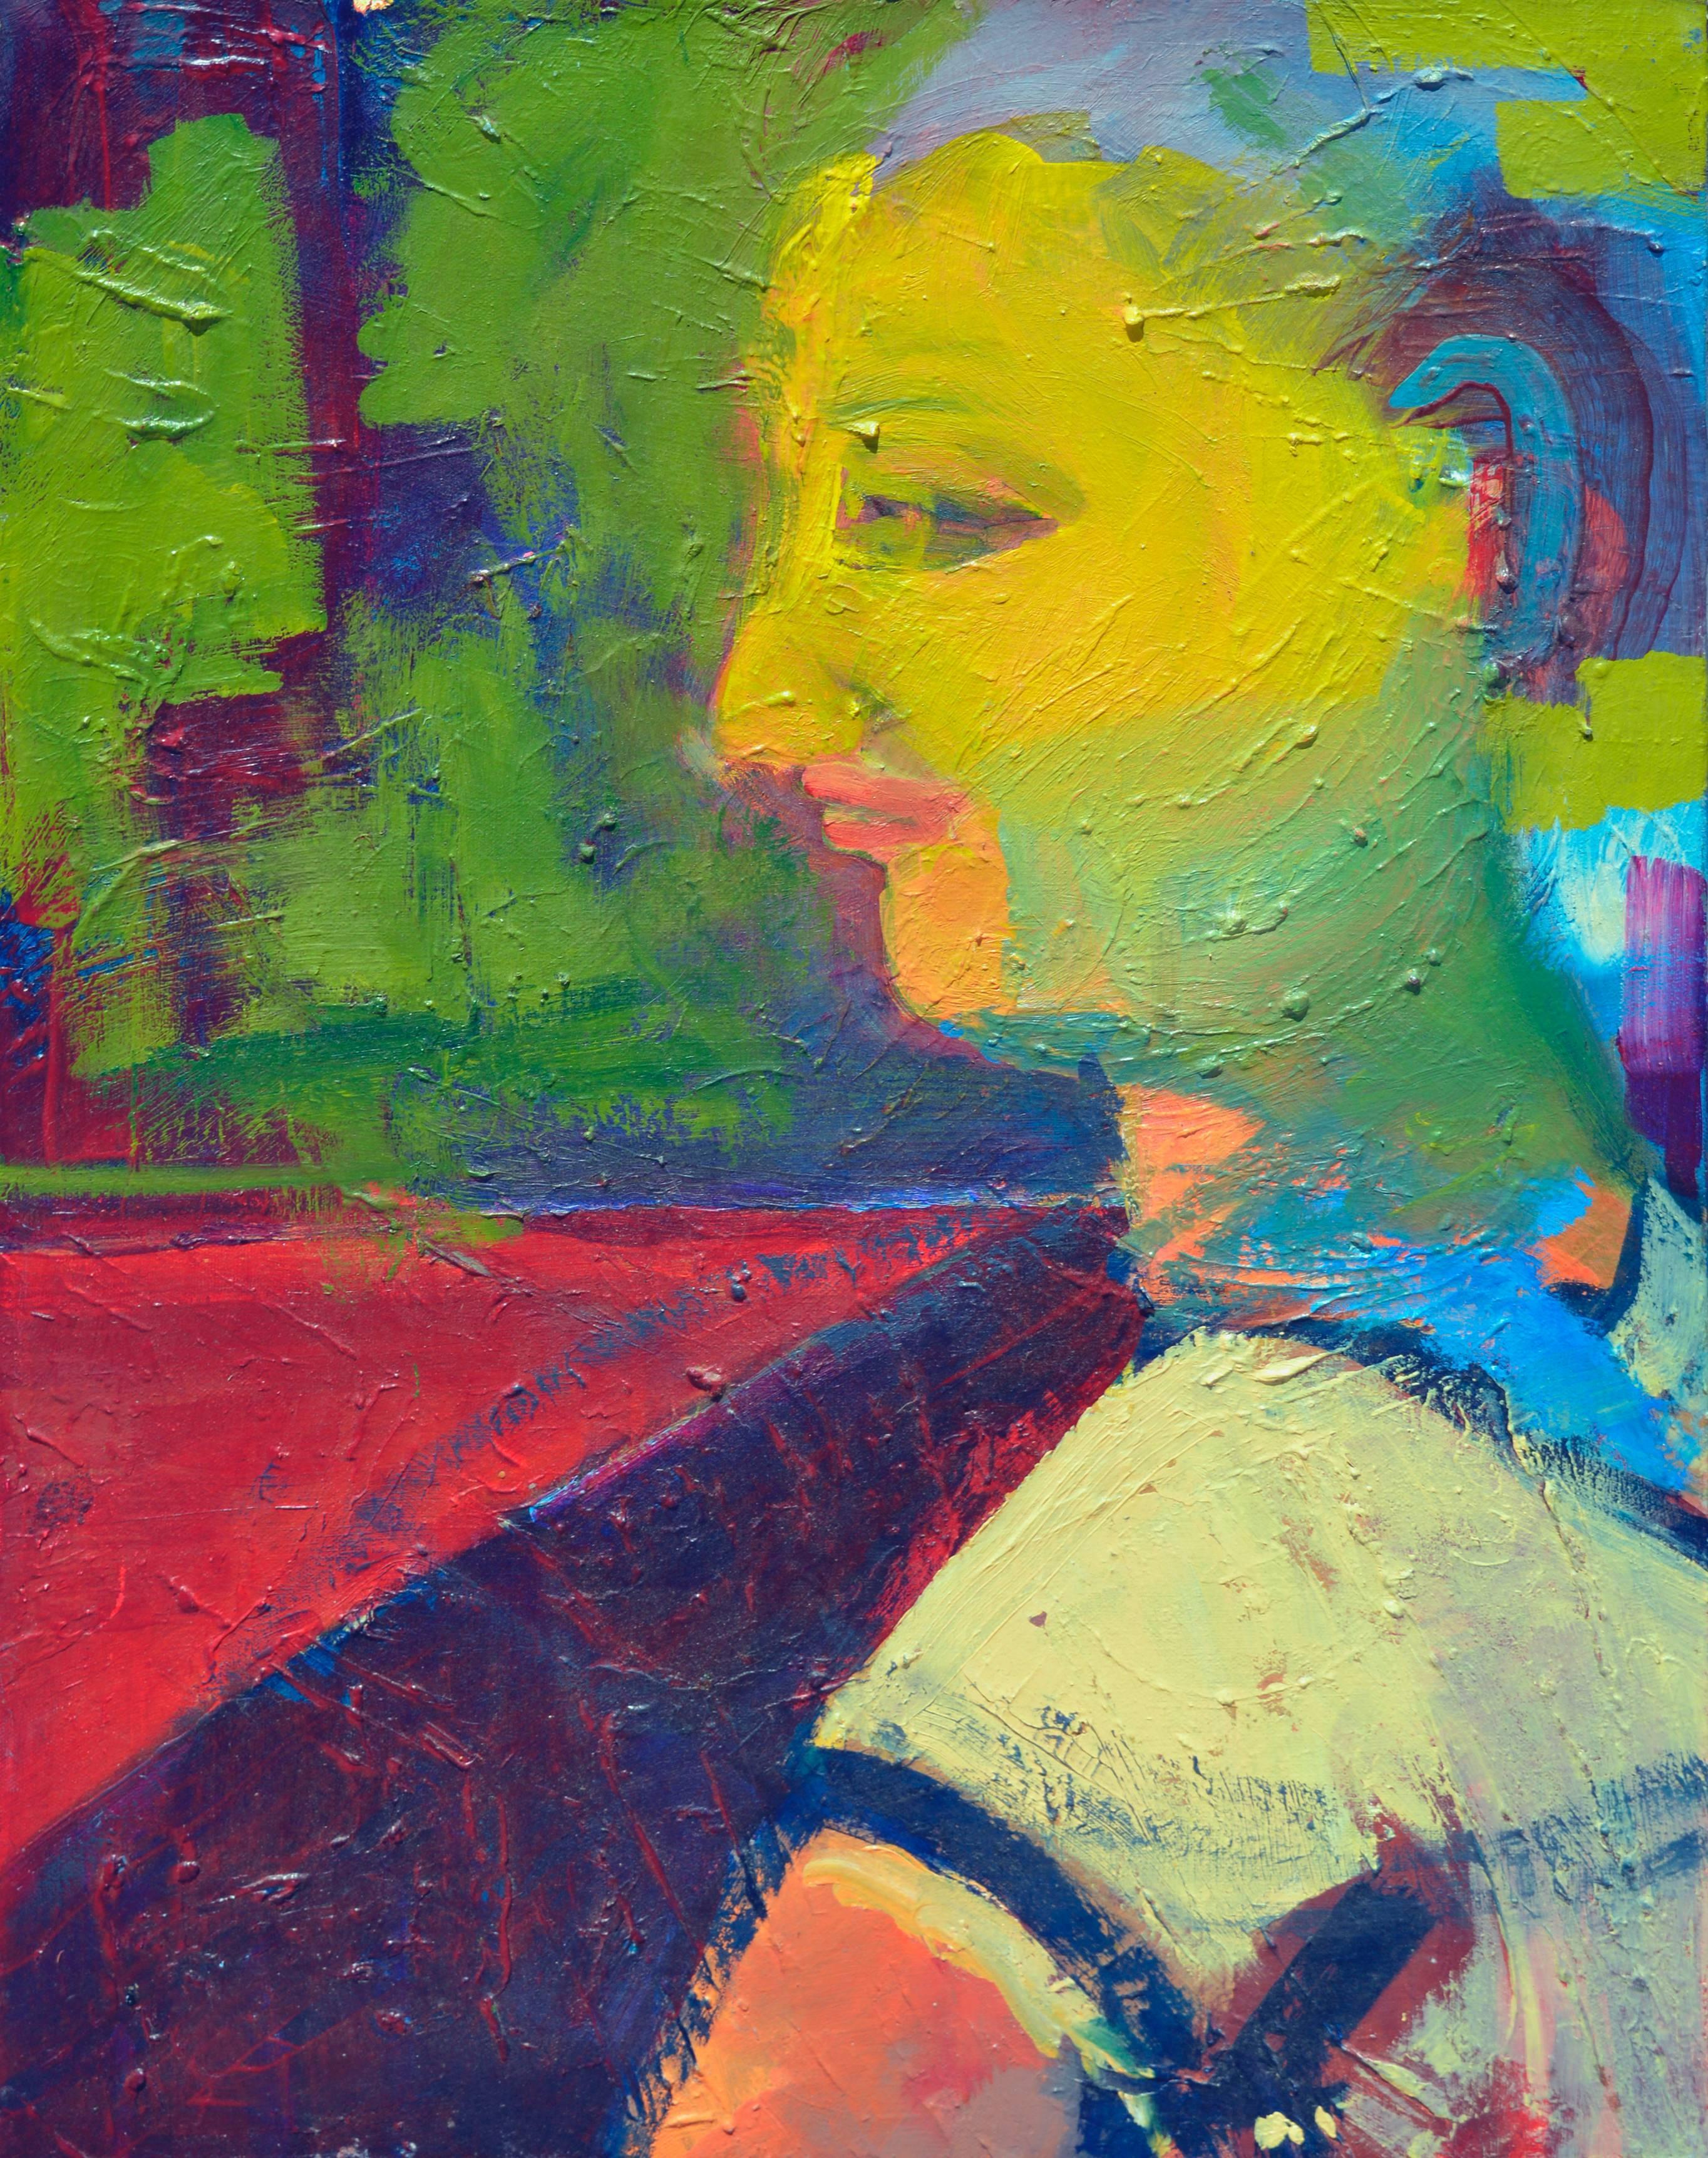 Child in Chicken Yard Fauvist Abstract Expressionist Portrait